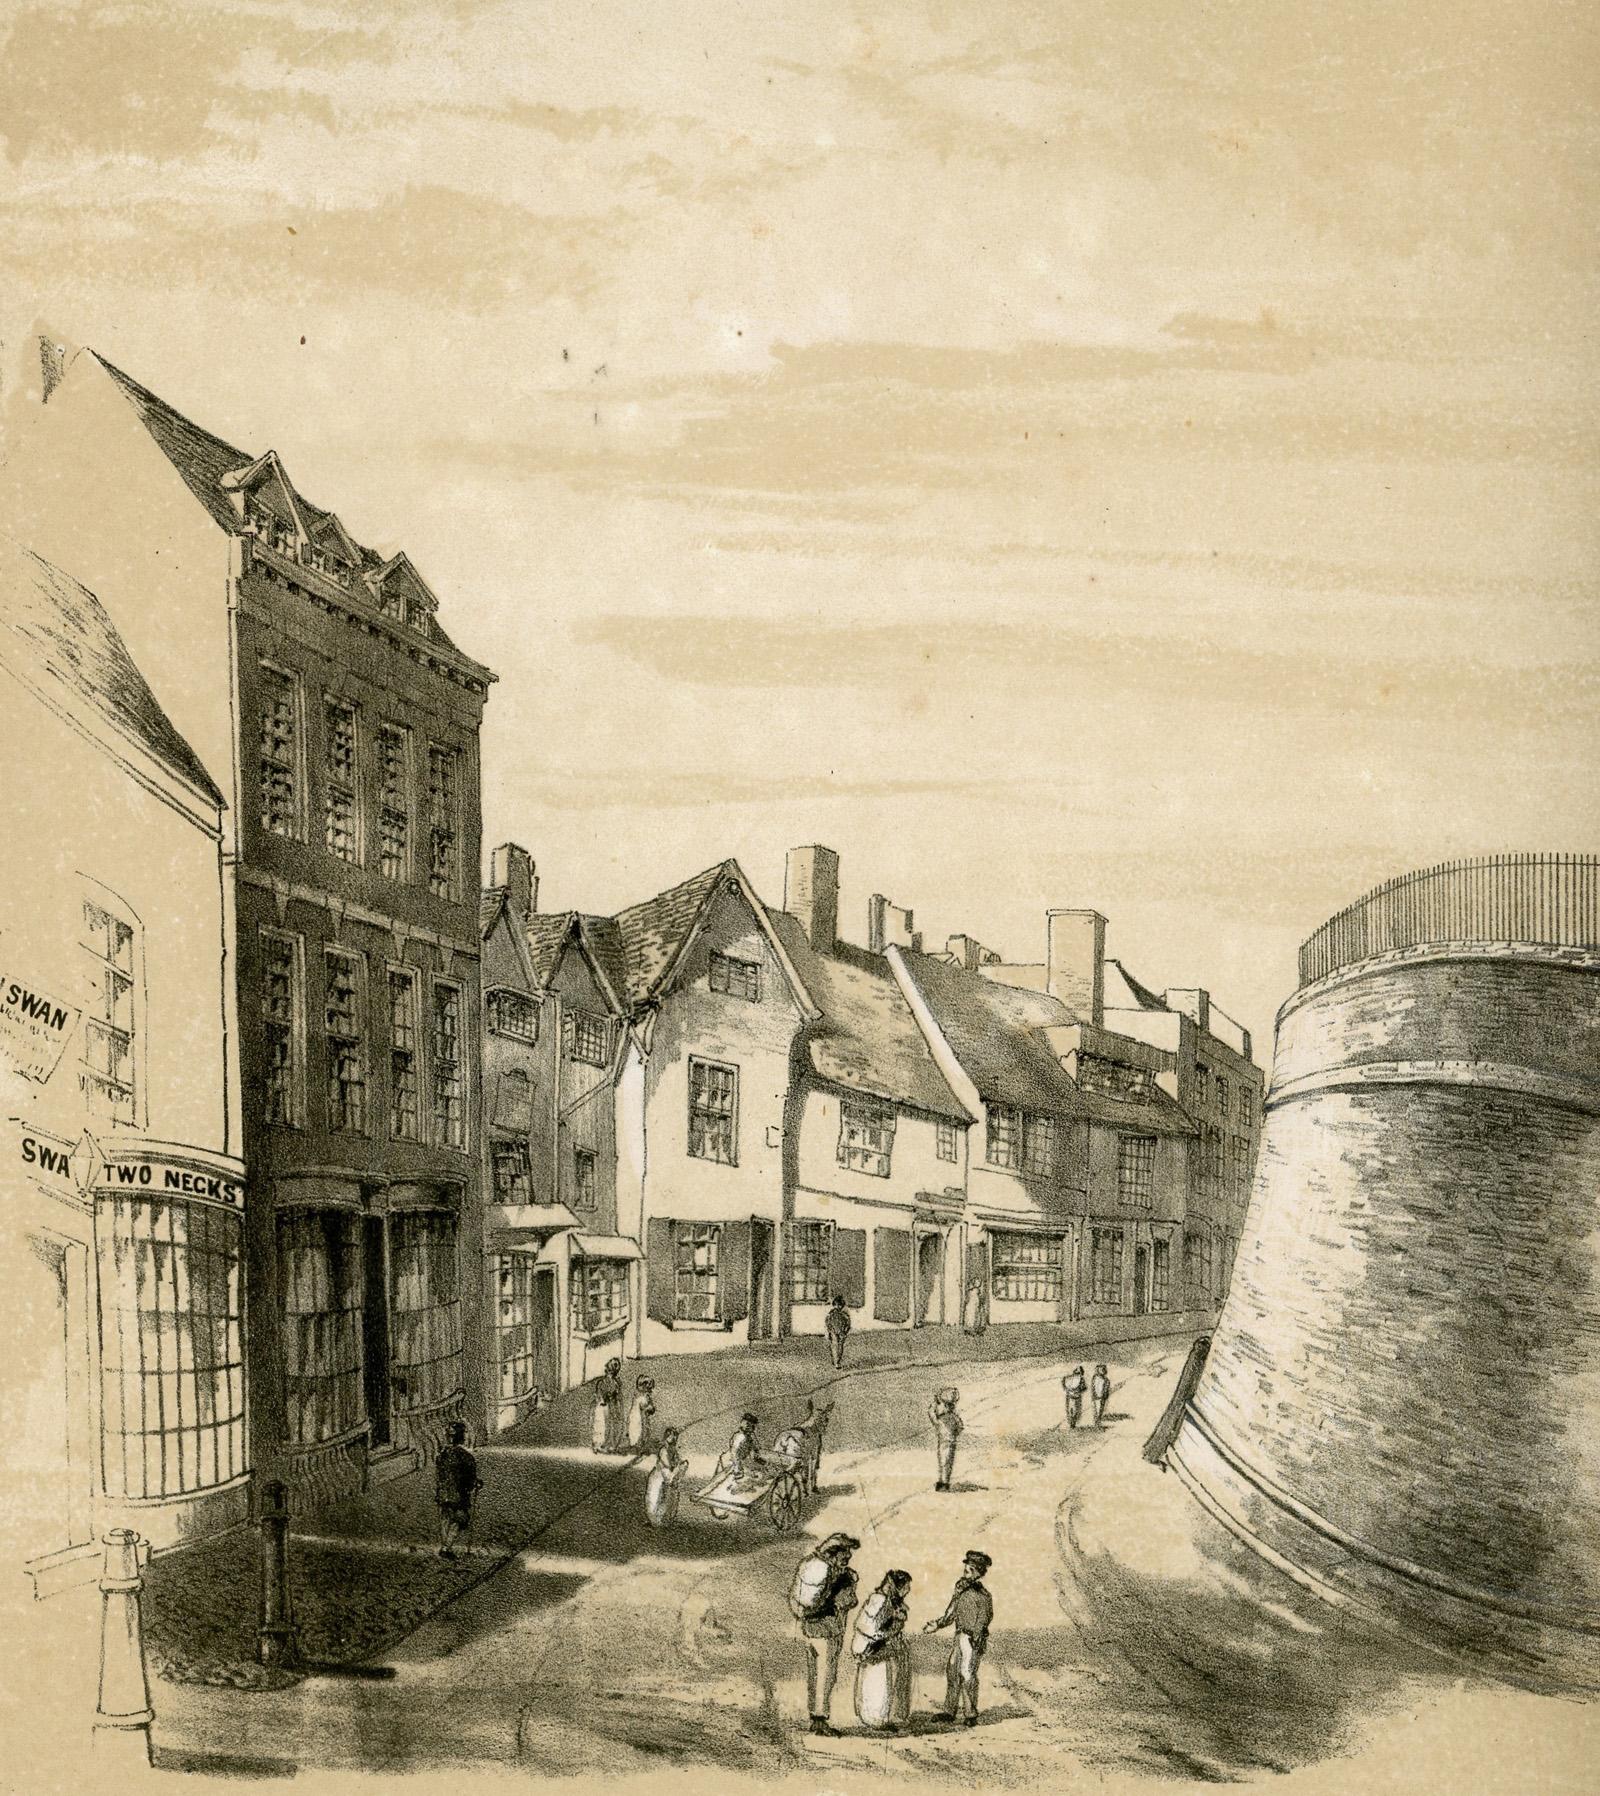 St Martins Lane Swan with Two Necks